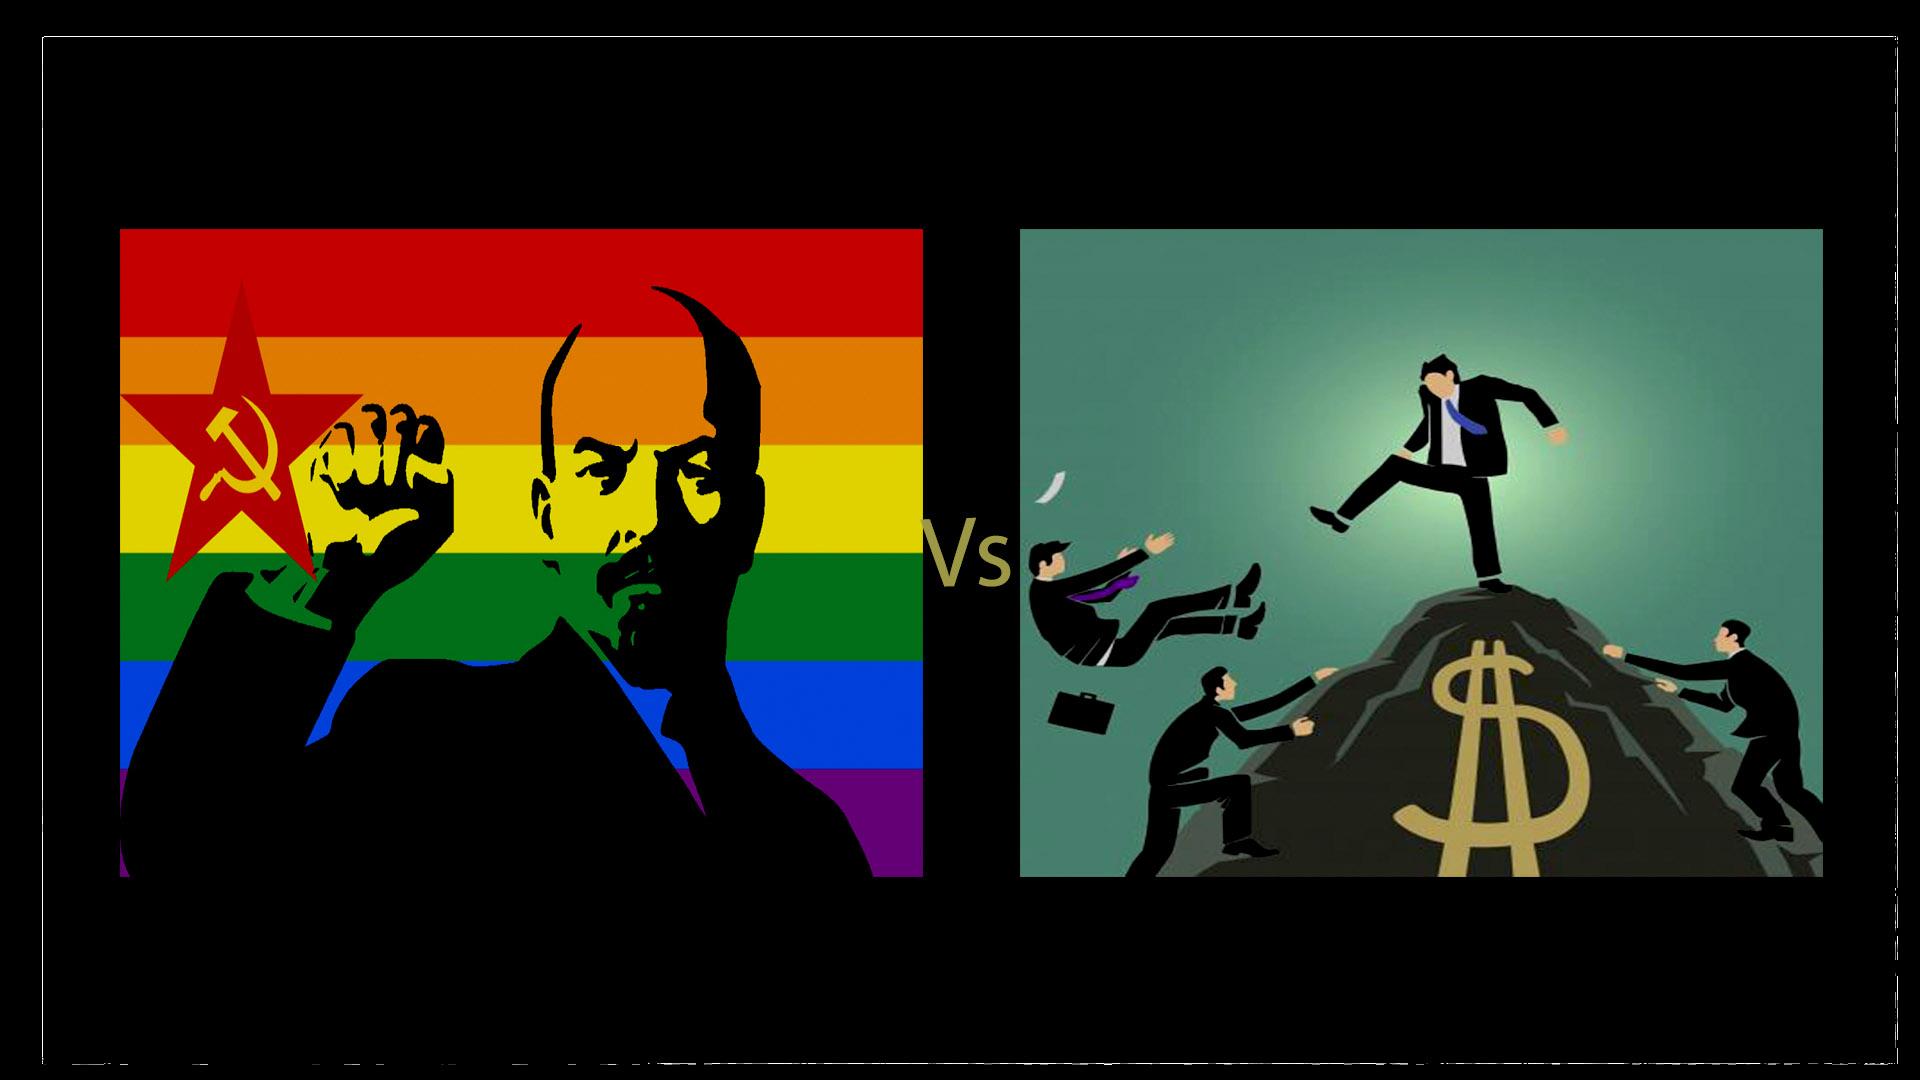 A Debate Capitalism Or Communism Sin Boldly Episode 110